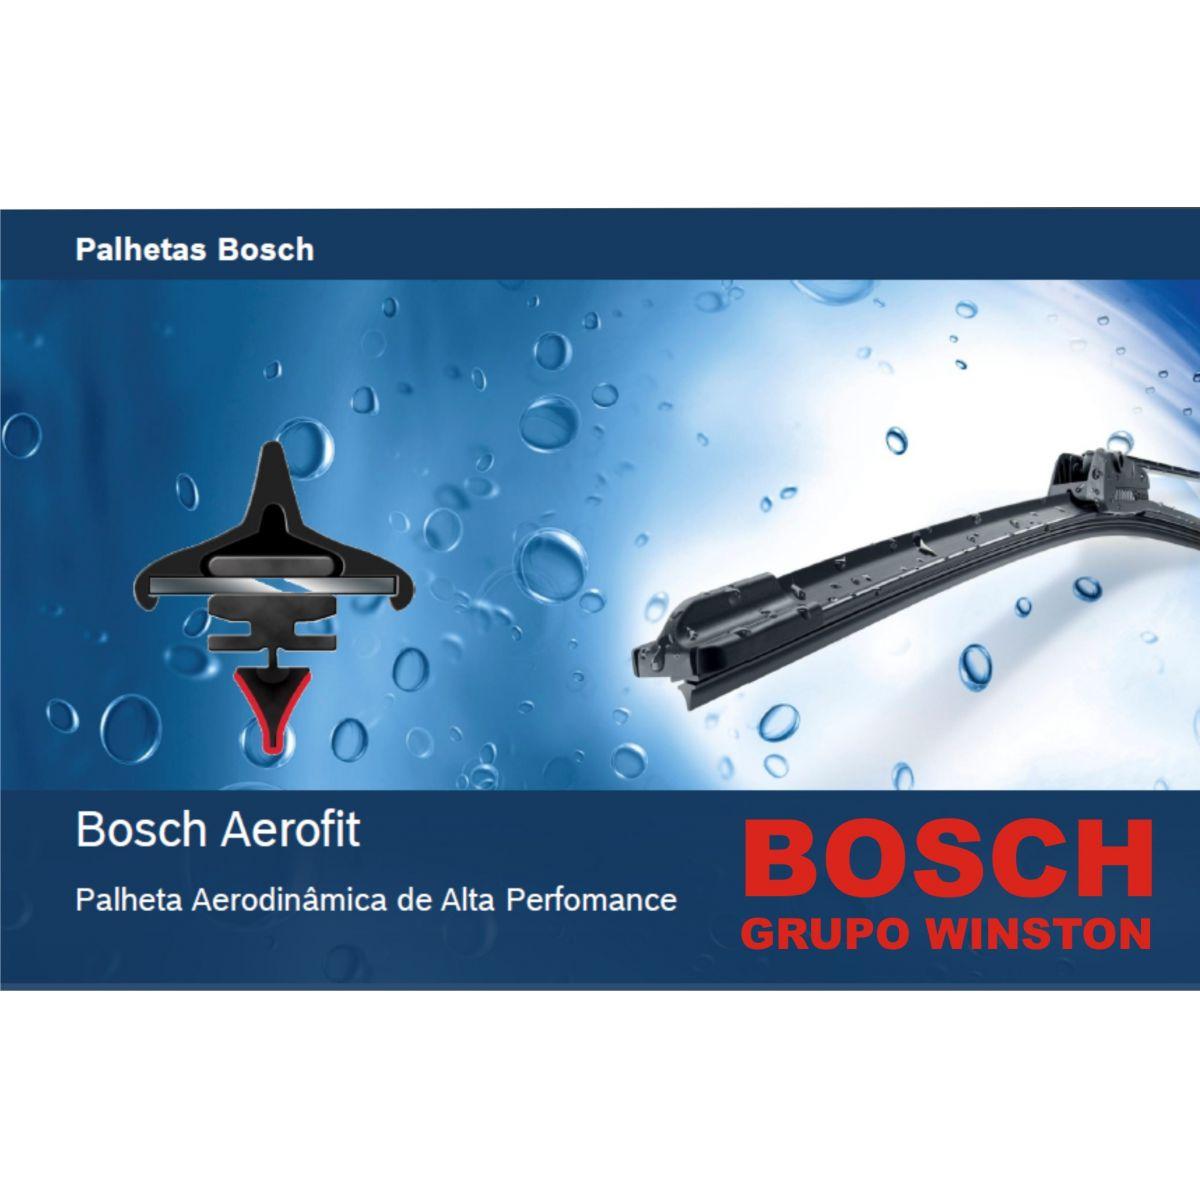 Palheta Bosch Aerofit Limpador de para brisa Bosch DAEWOO Nubira / Wagon